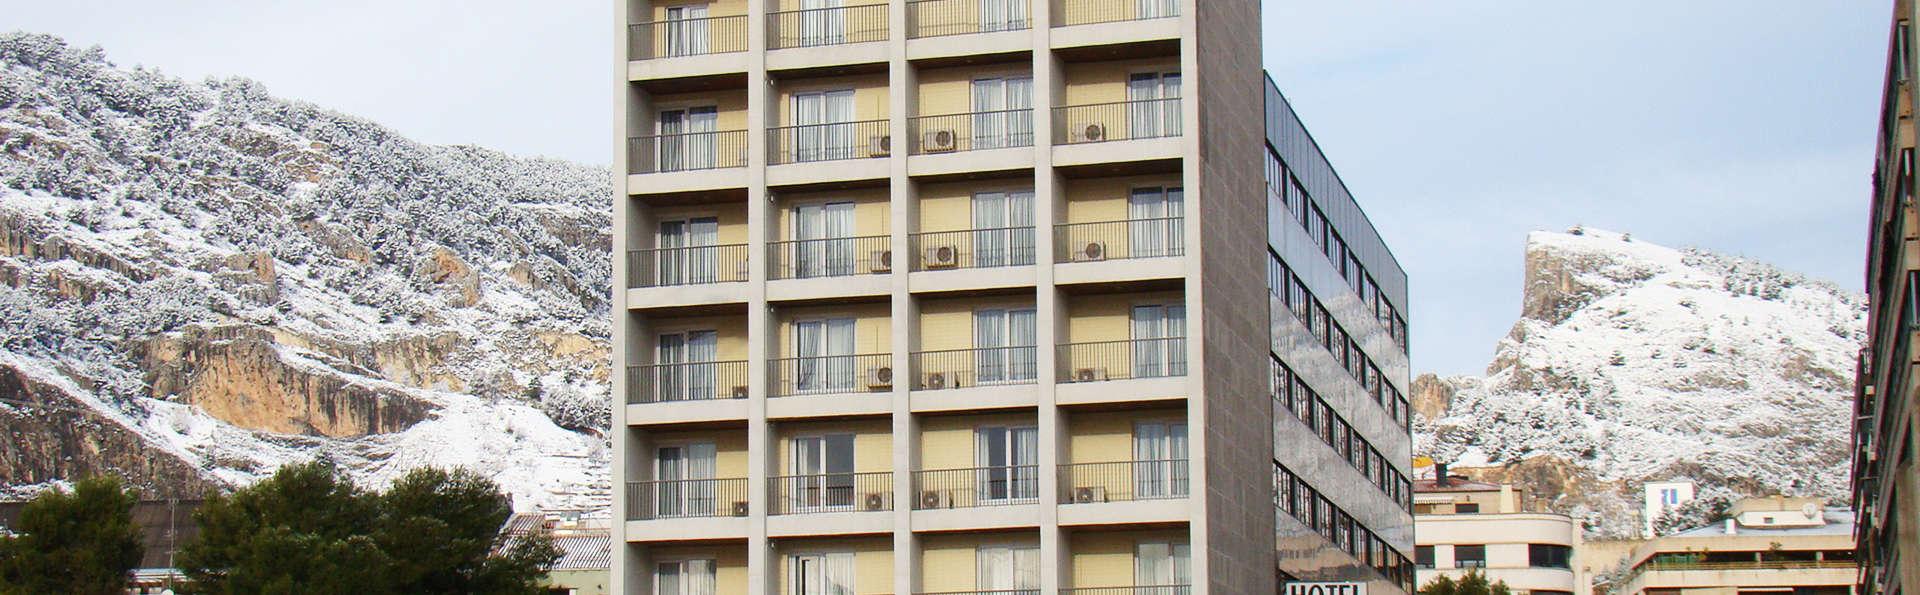 Hotel Reconquista - EDIT_front.jpg